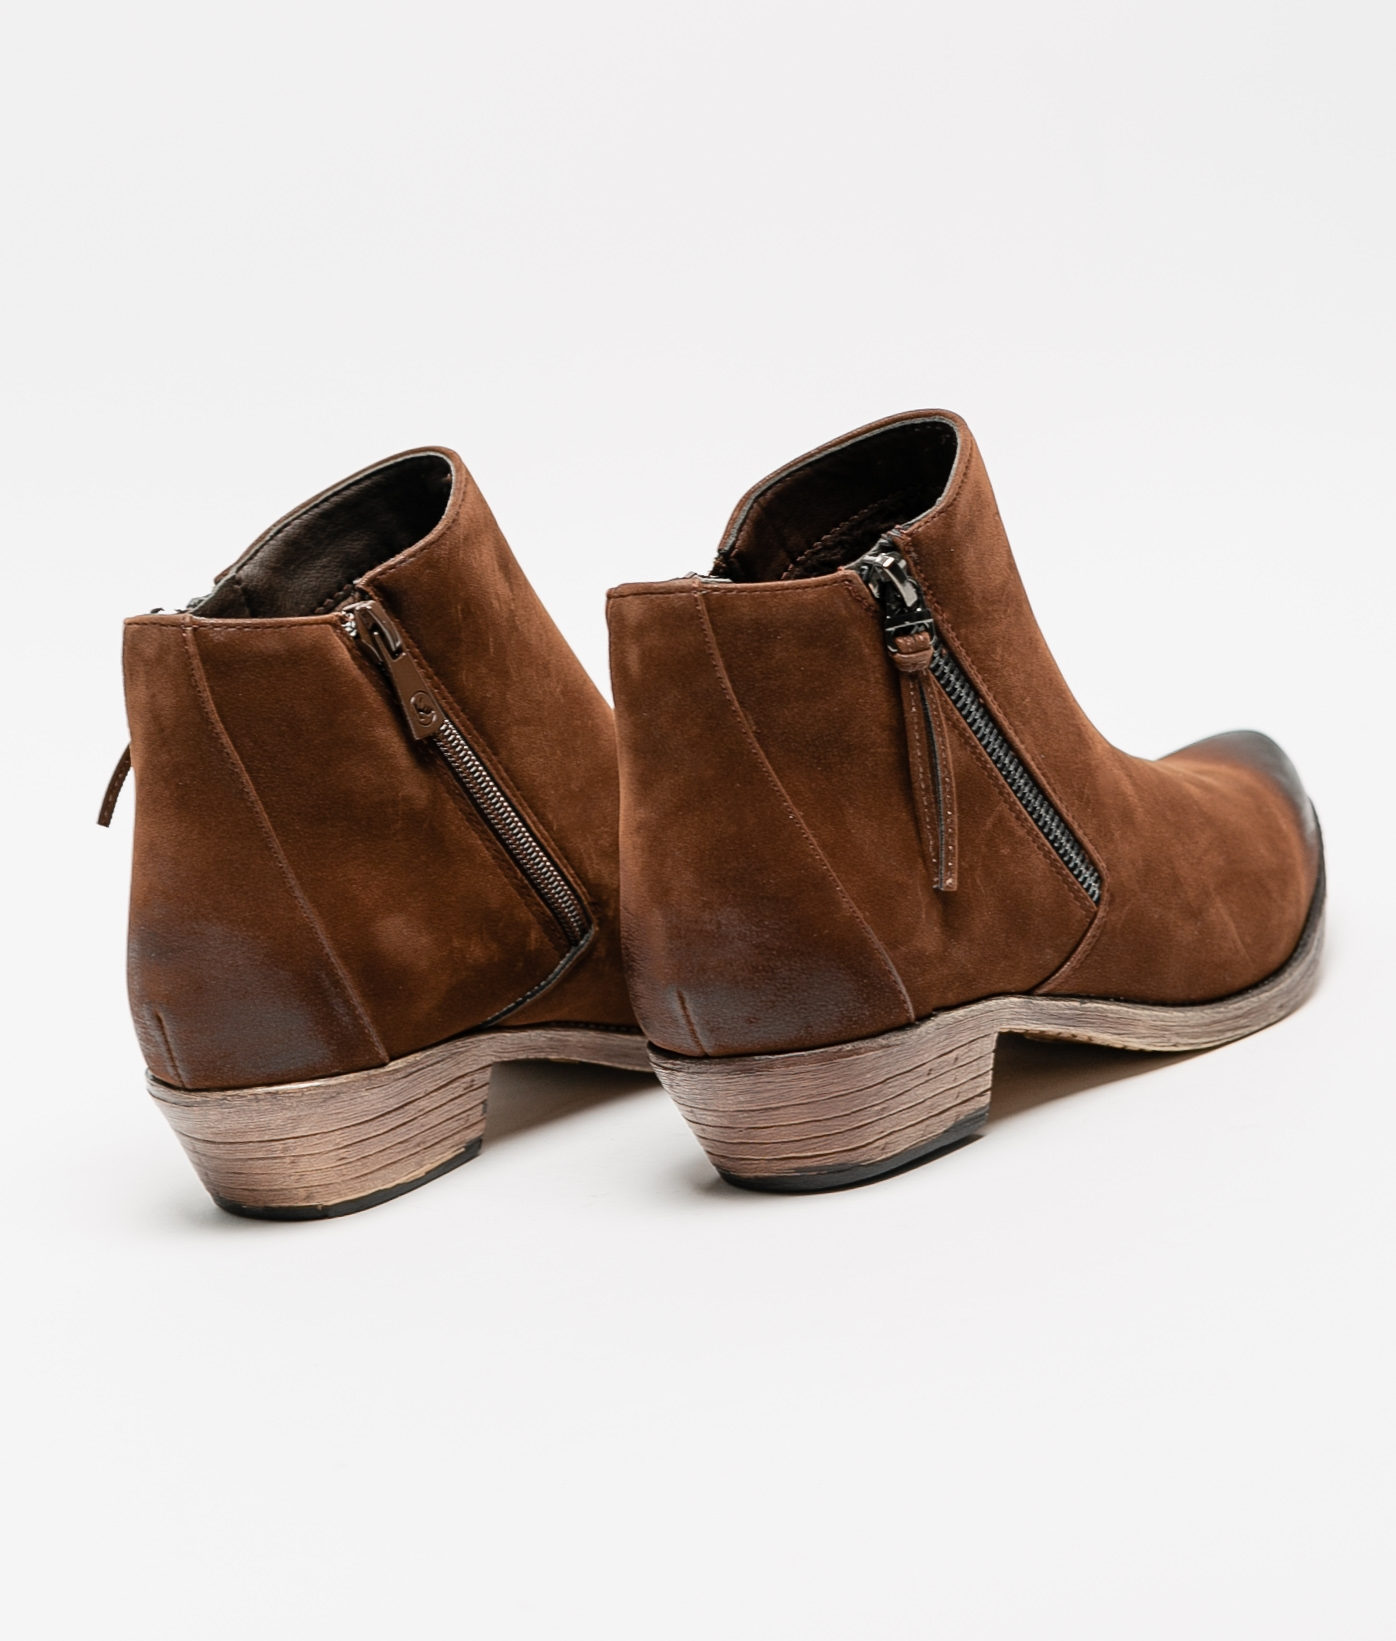 Cuvel Low Boot - Brown